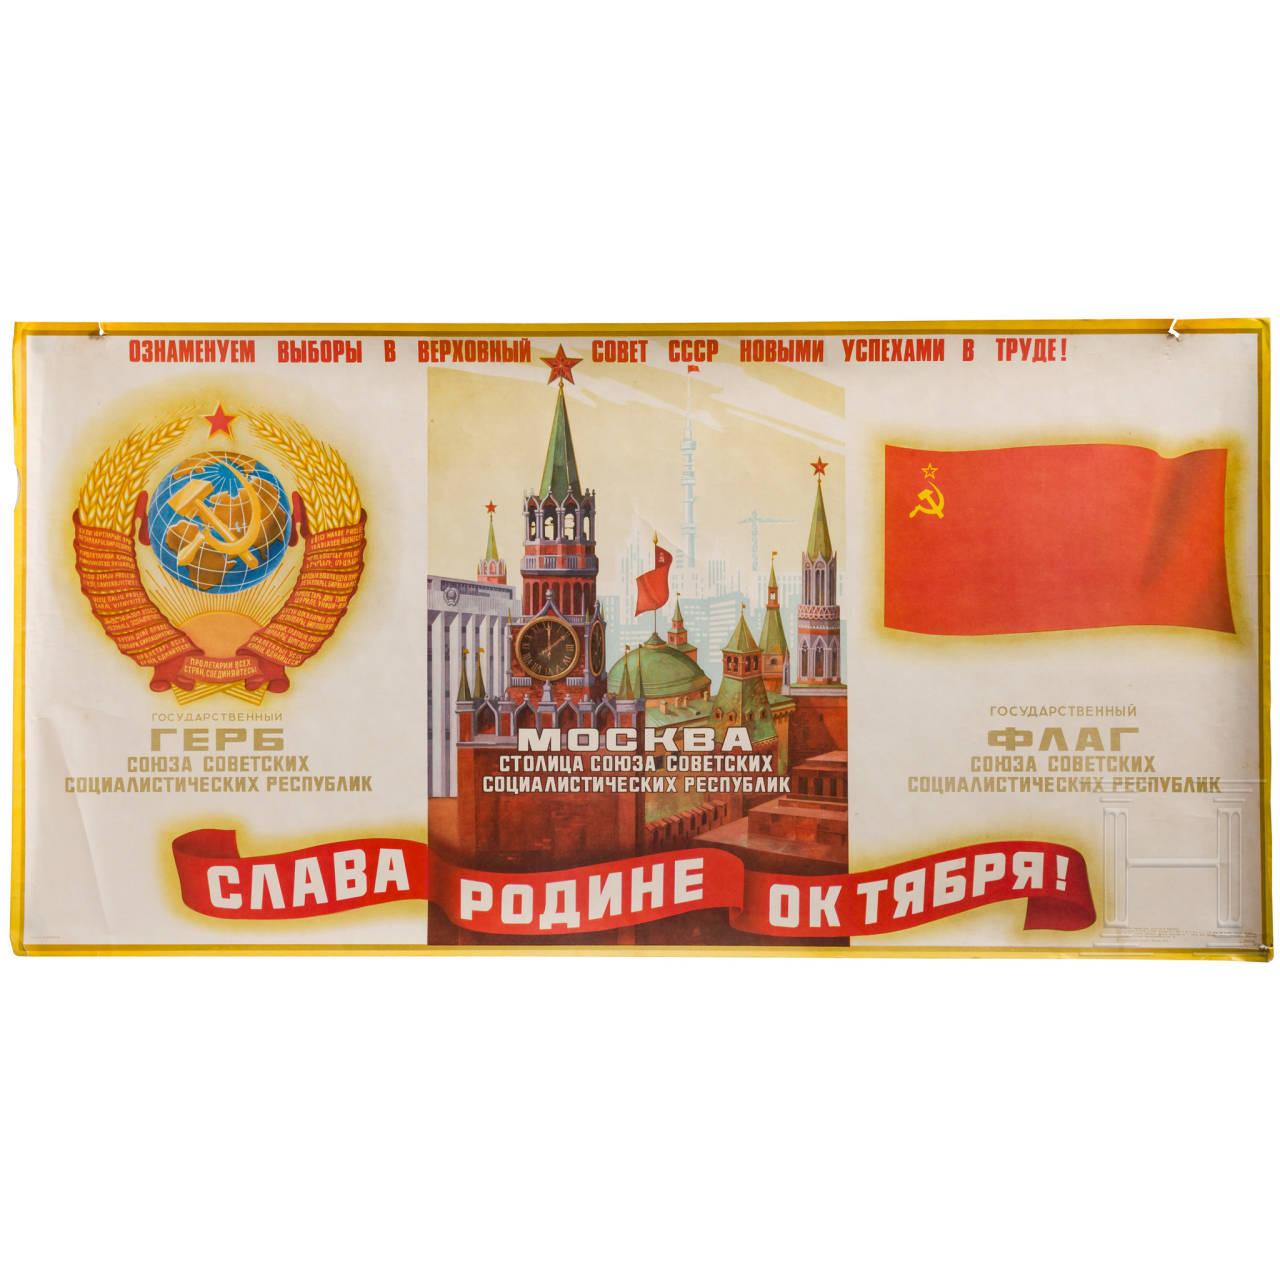 Drei Propagandaplakate, 1970er/80er Jahre